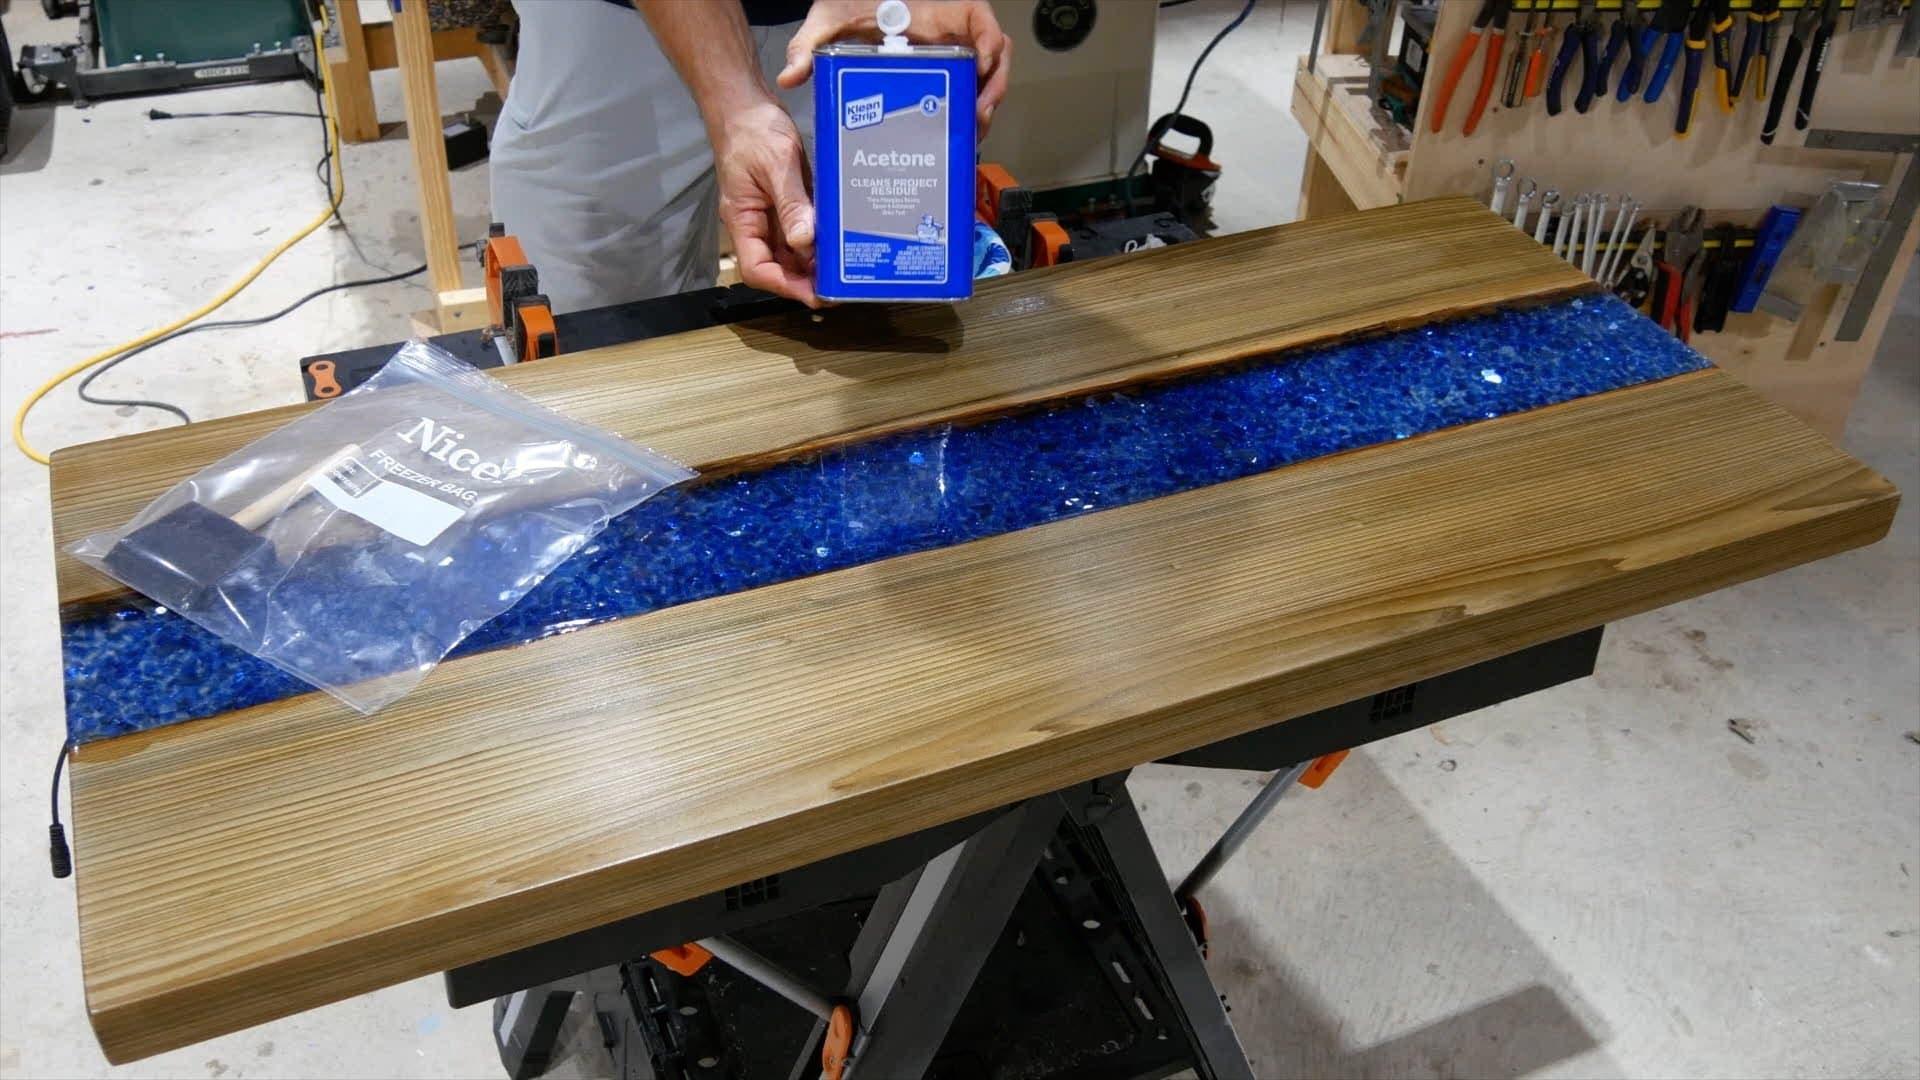 epoxy-resin-river-table-glowpowder_20171016_84